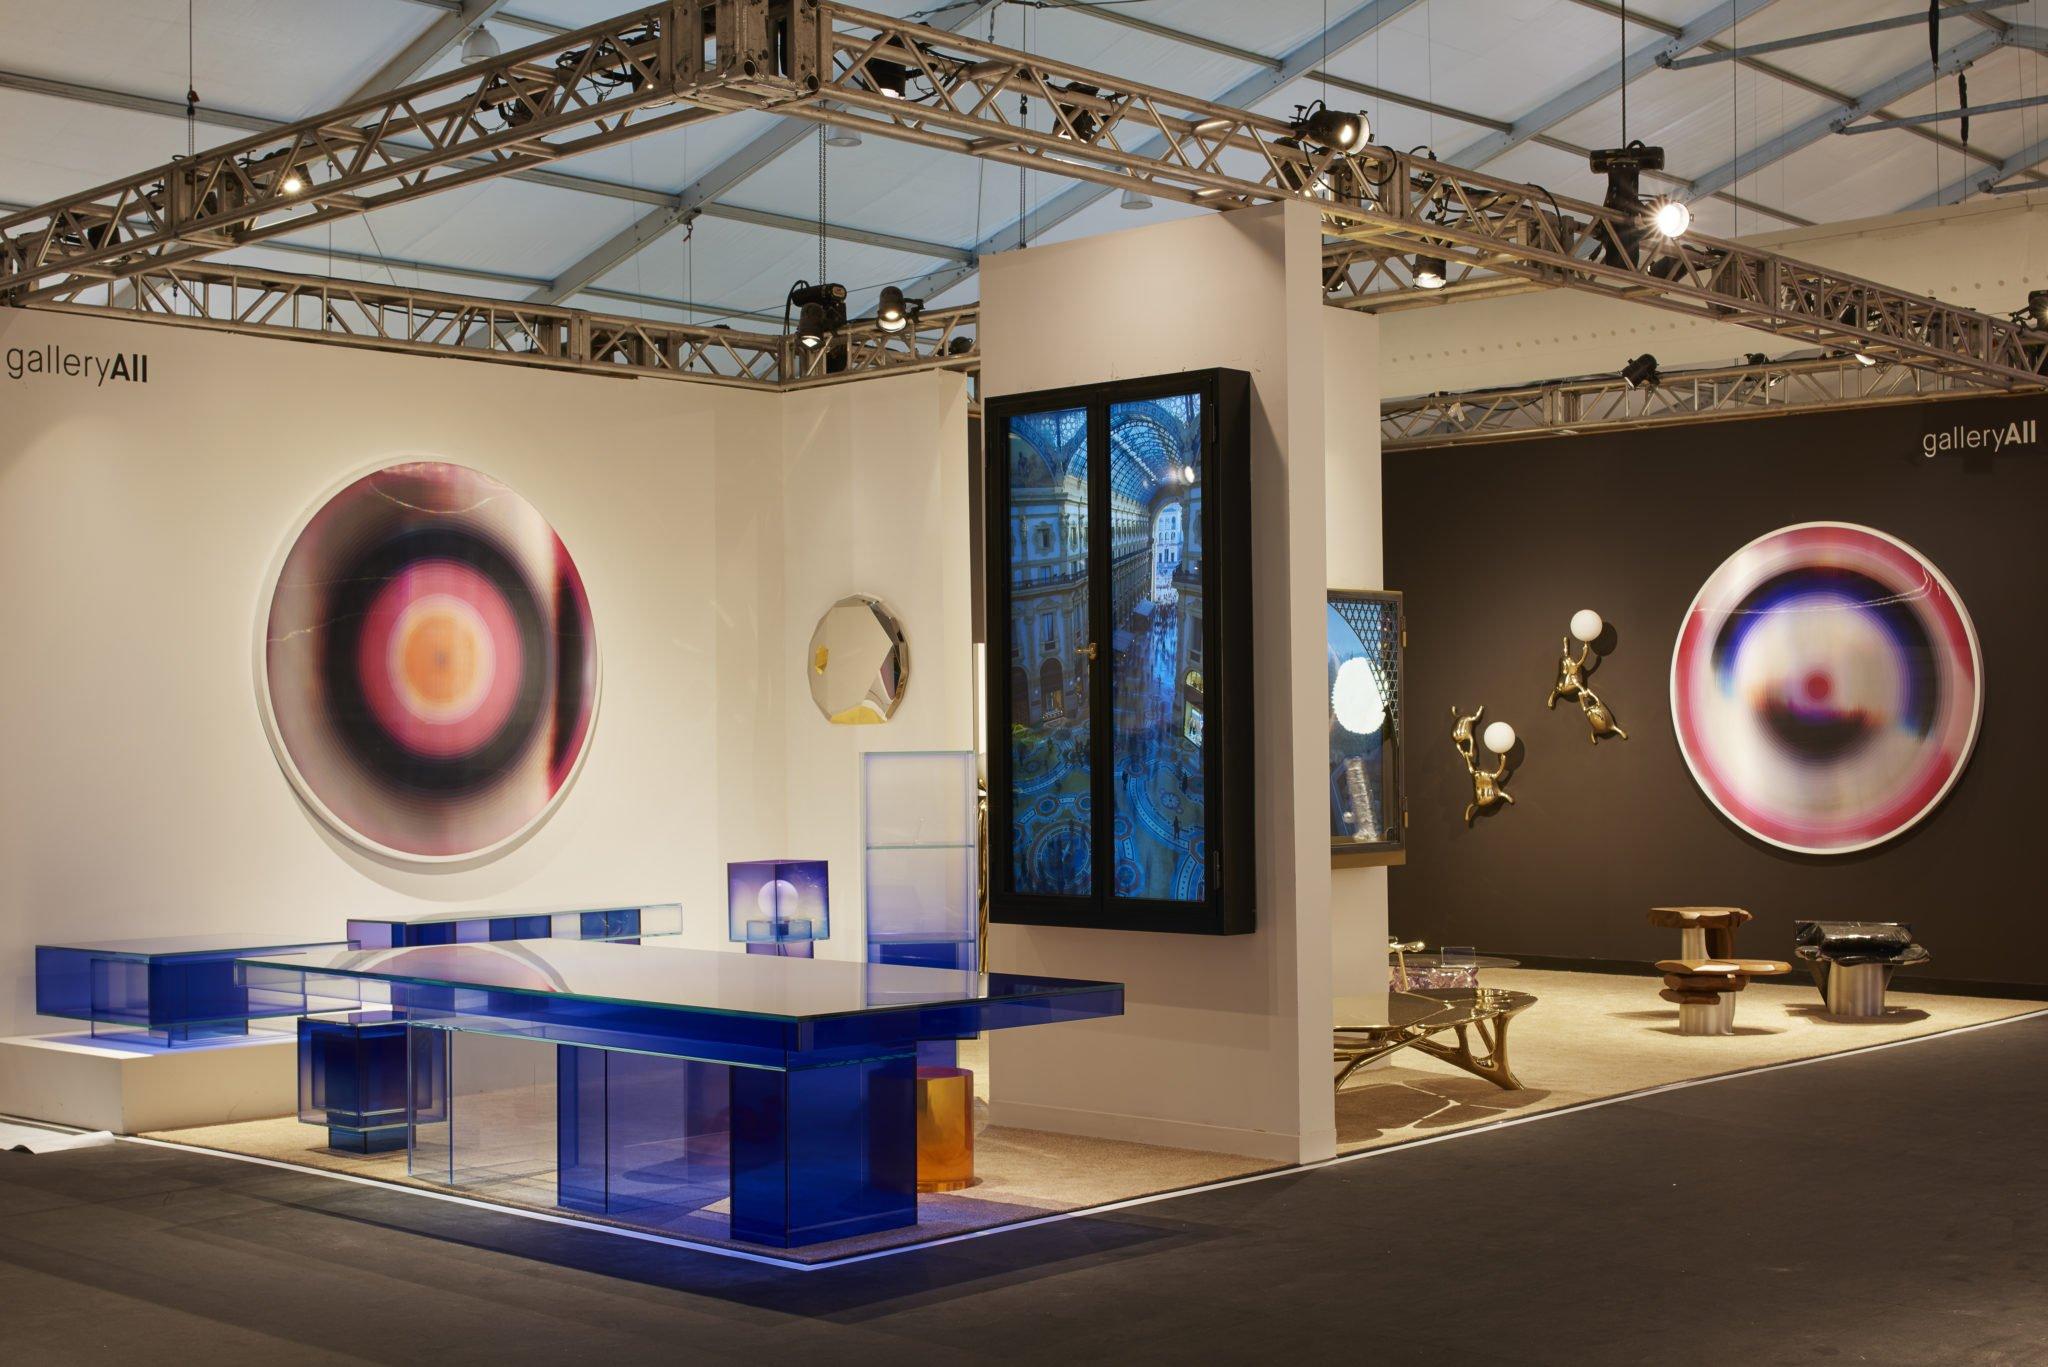 Design Miami 2019, Gallery ALL's booth